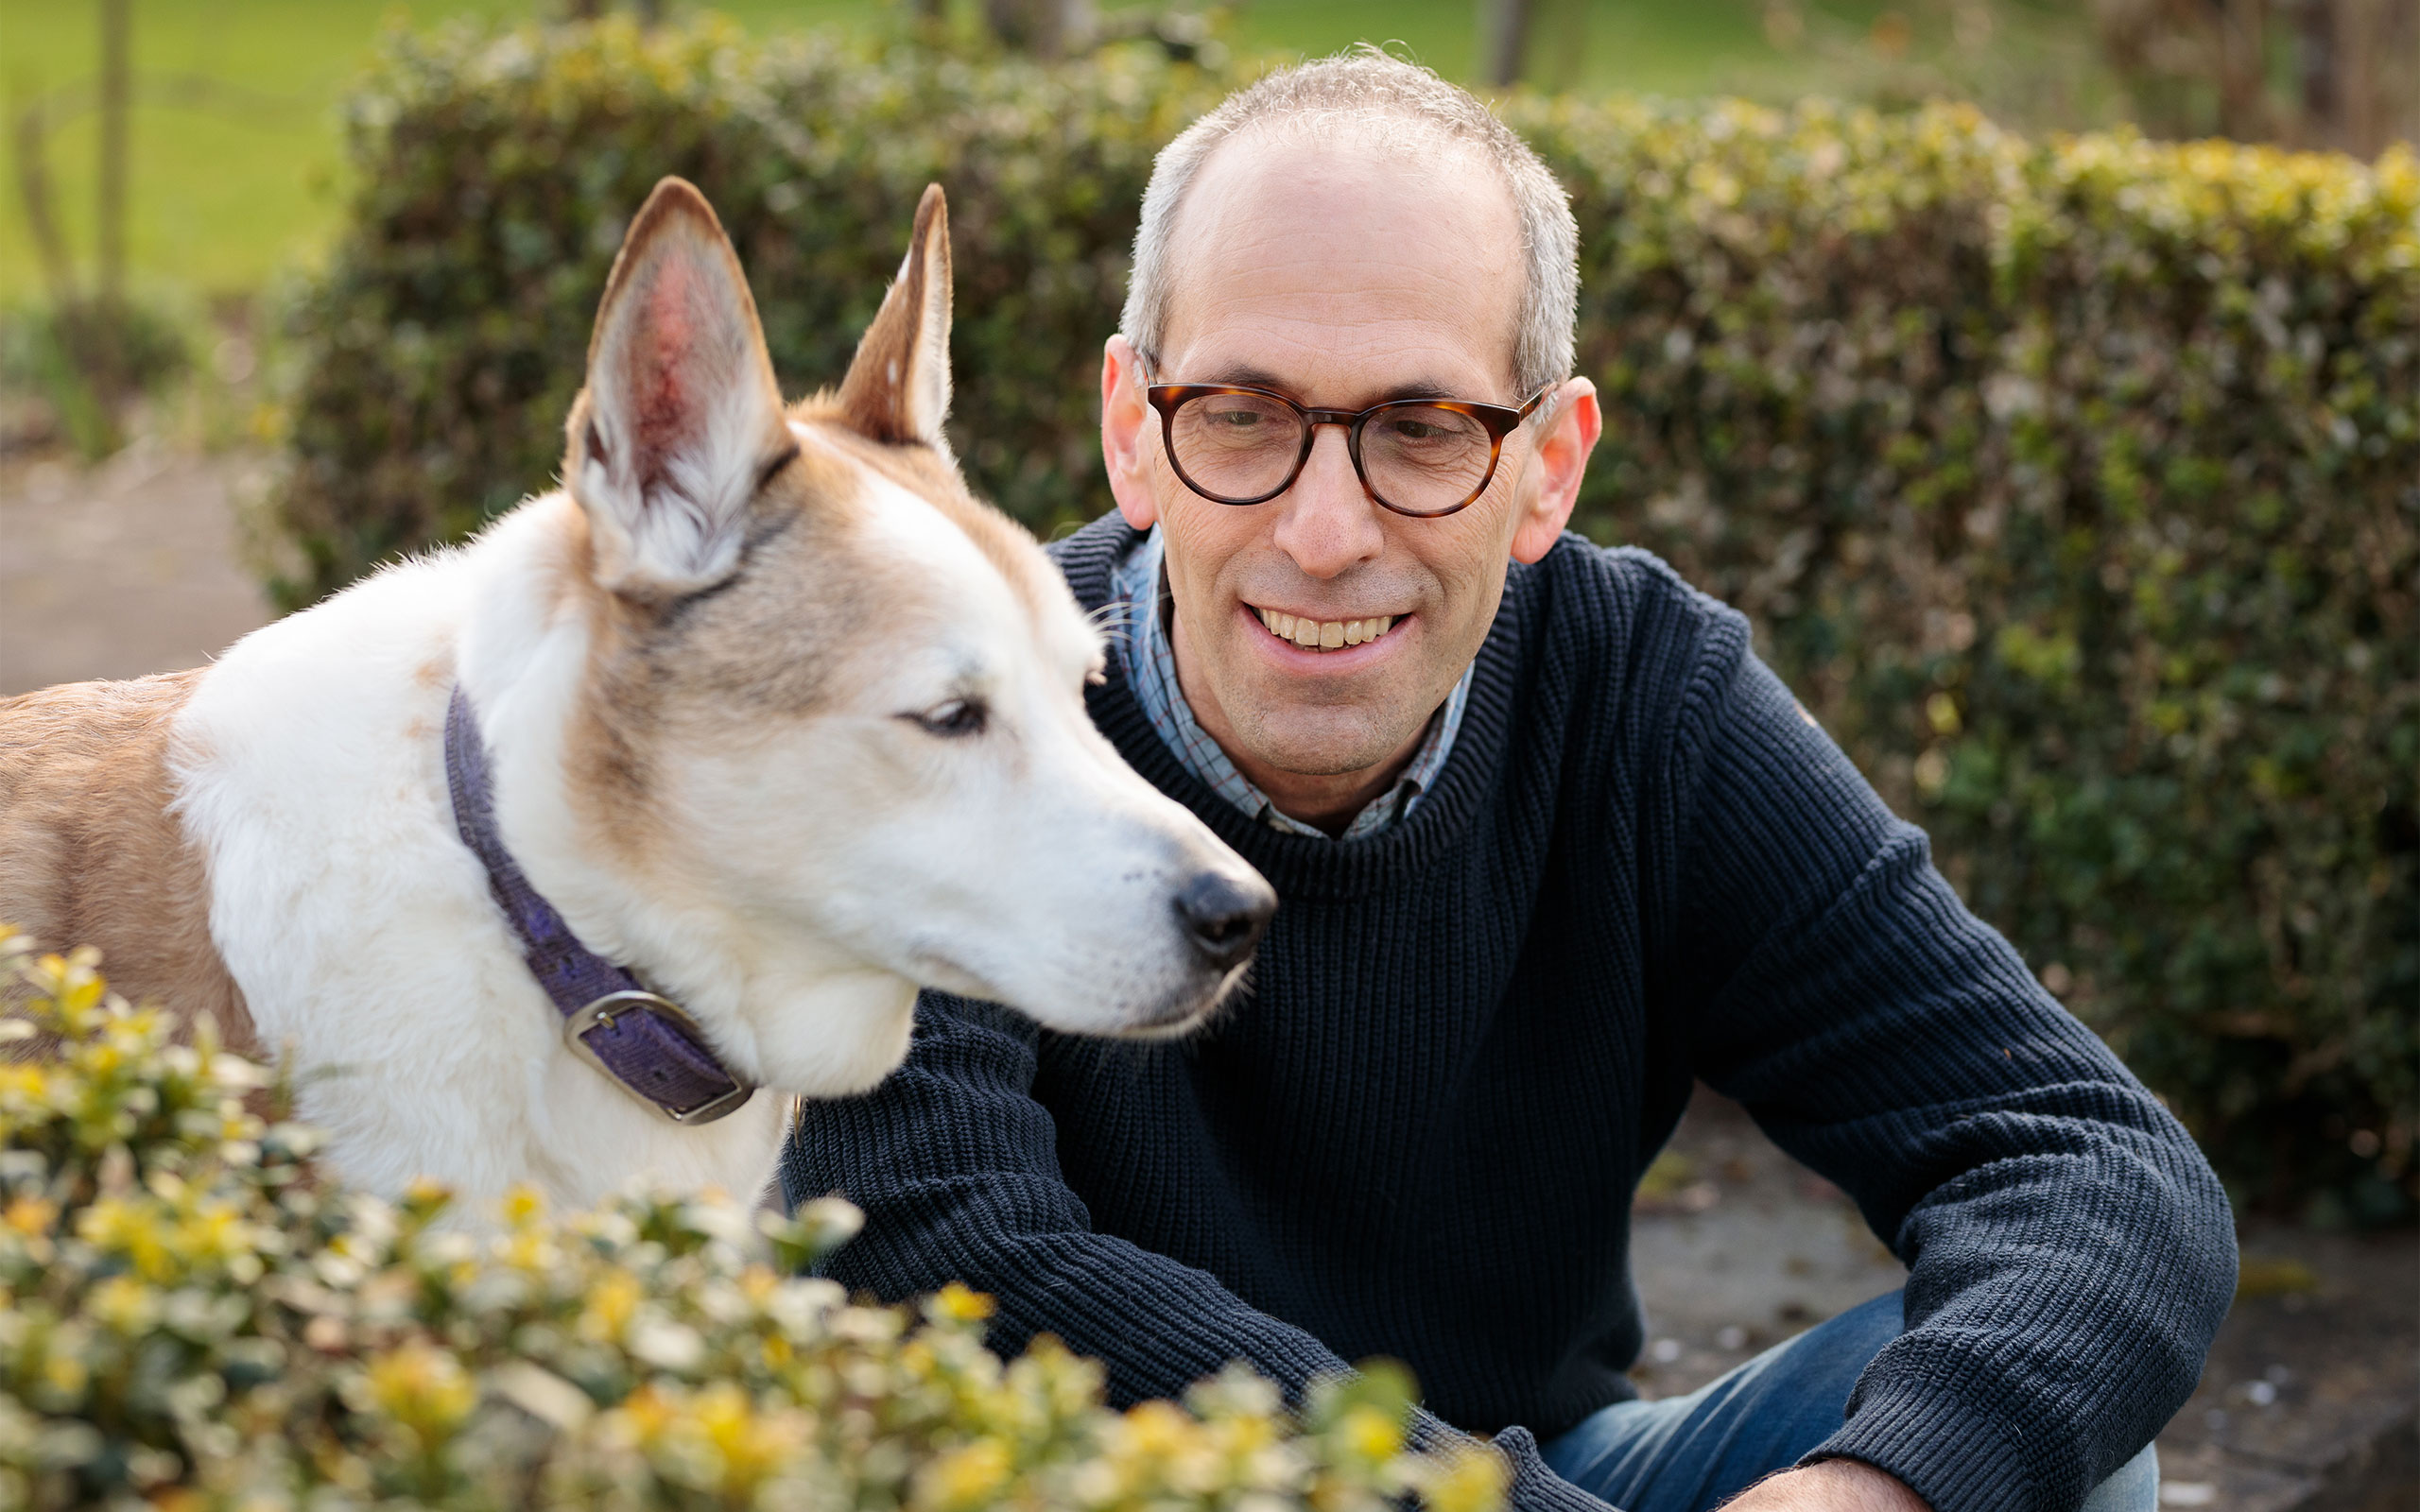 The zoologist Arik Kershenbaum of the University of Cambridge and his dog.